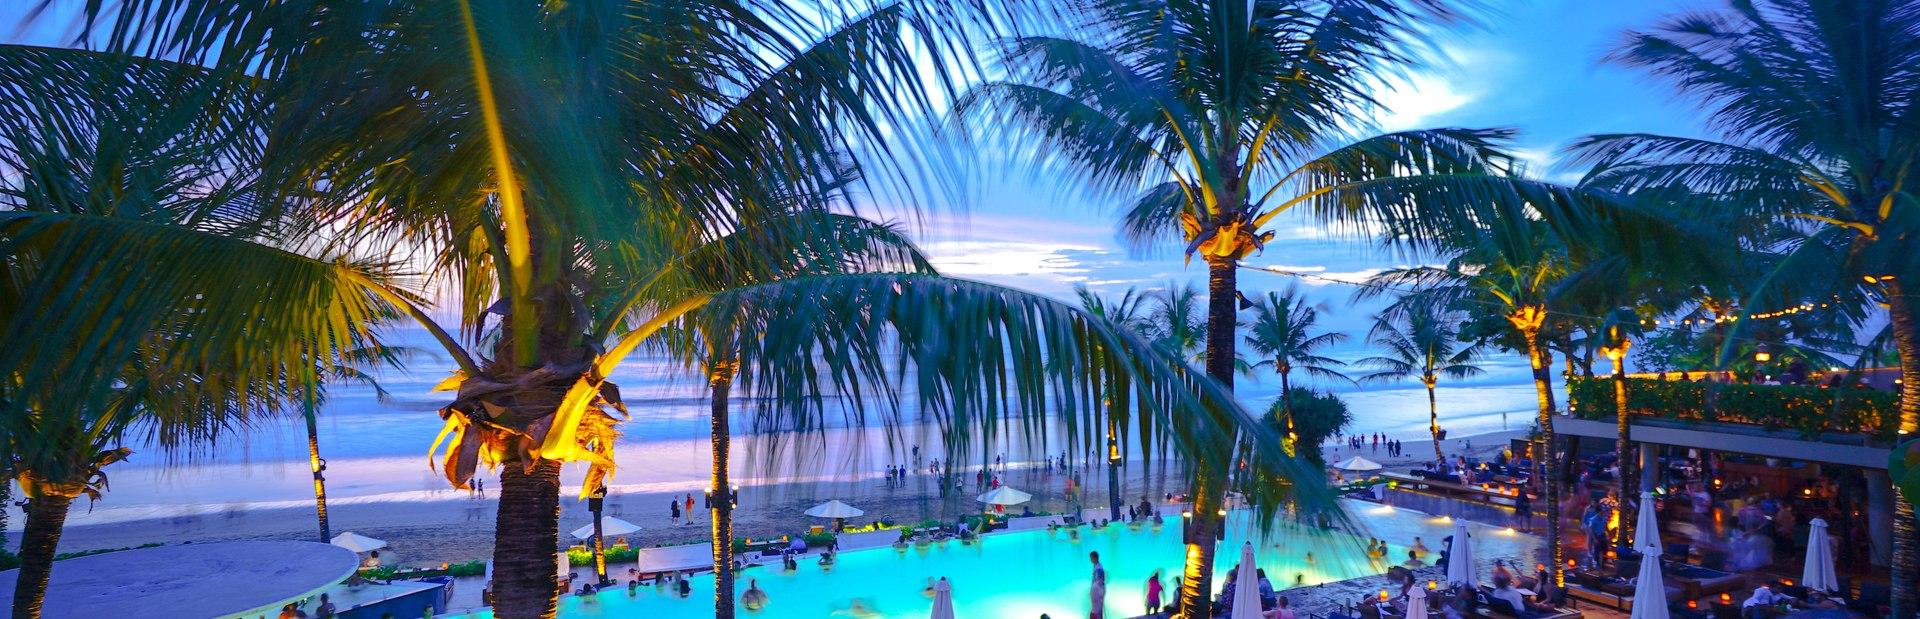 9 of the best Mediterranean beach clubs to visit by superyacht